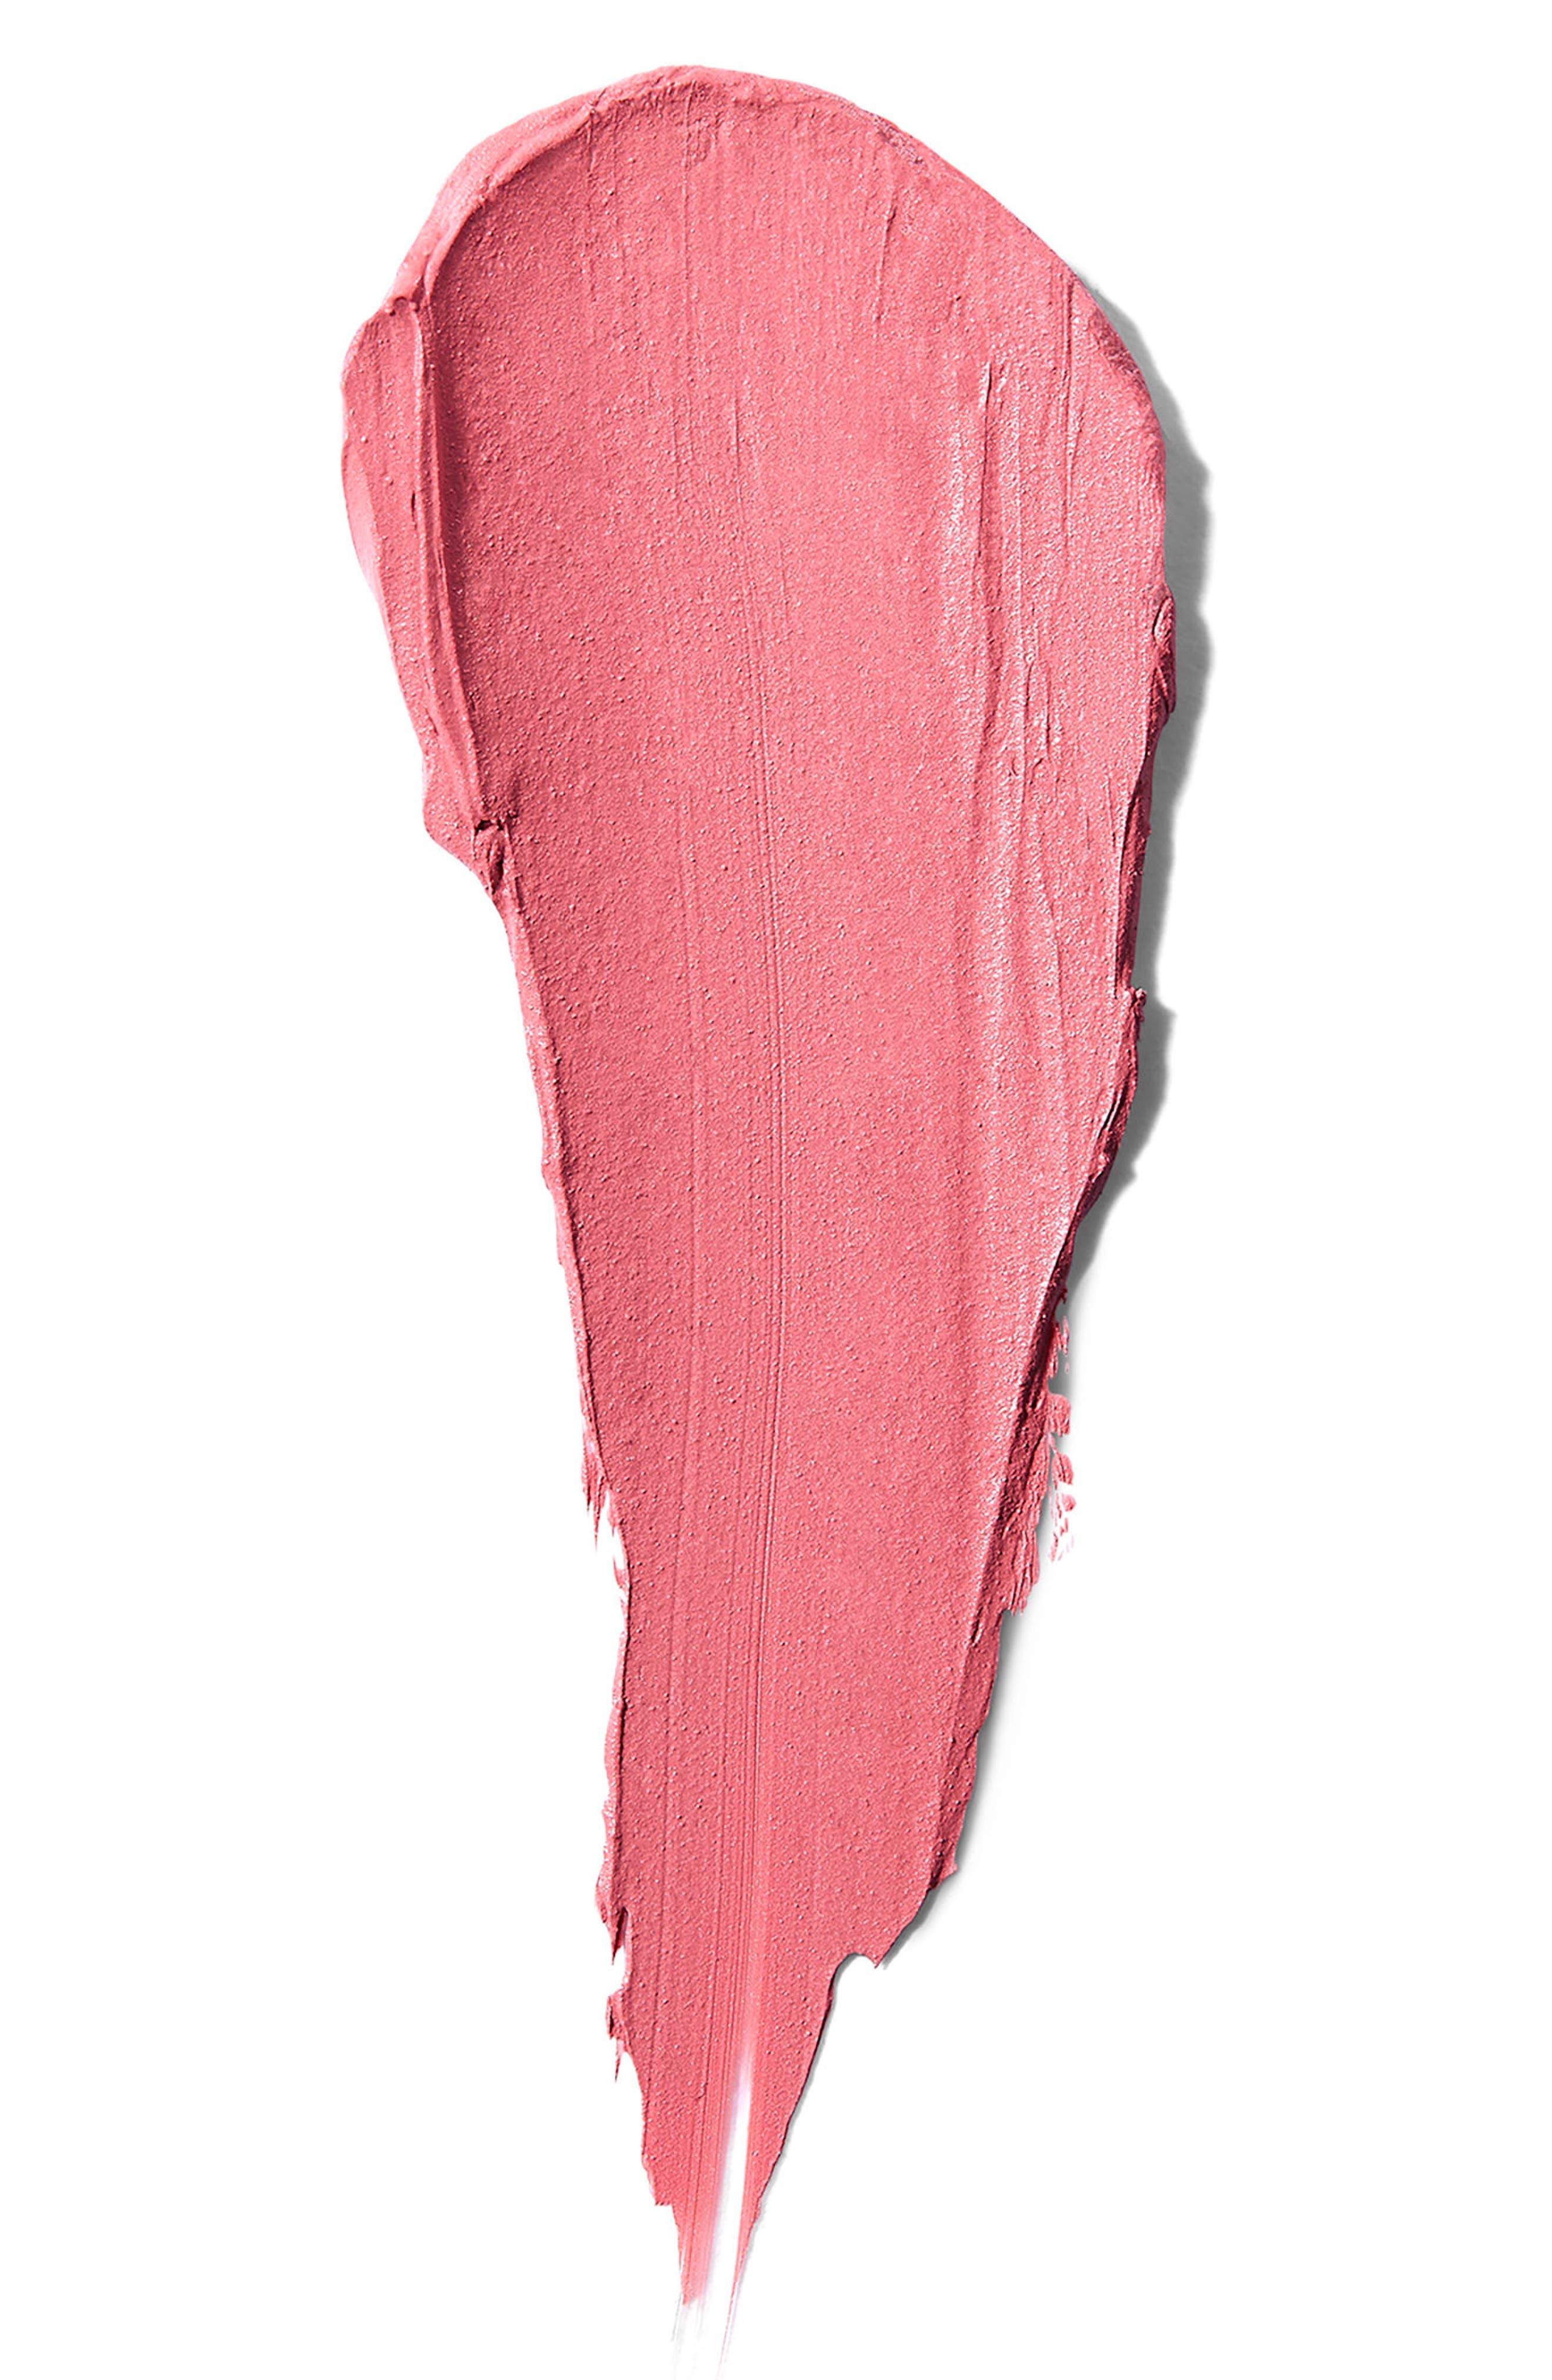 Cellular Radiance Cream Blush,                             Alternate thumbnail 2, color,                             Rose Glow